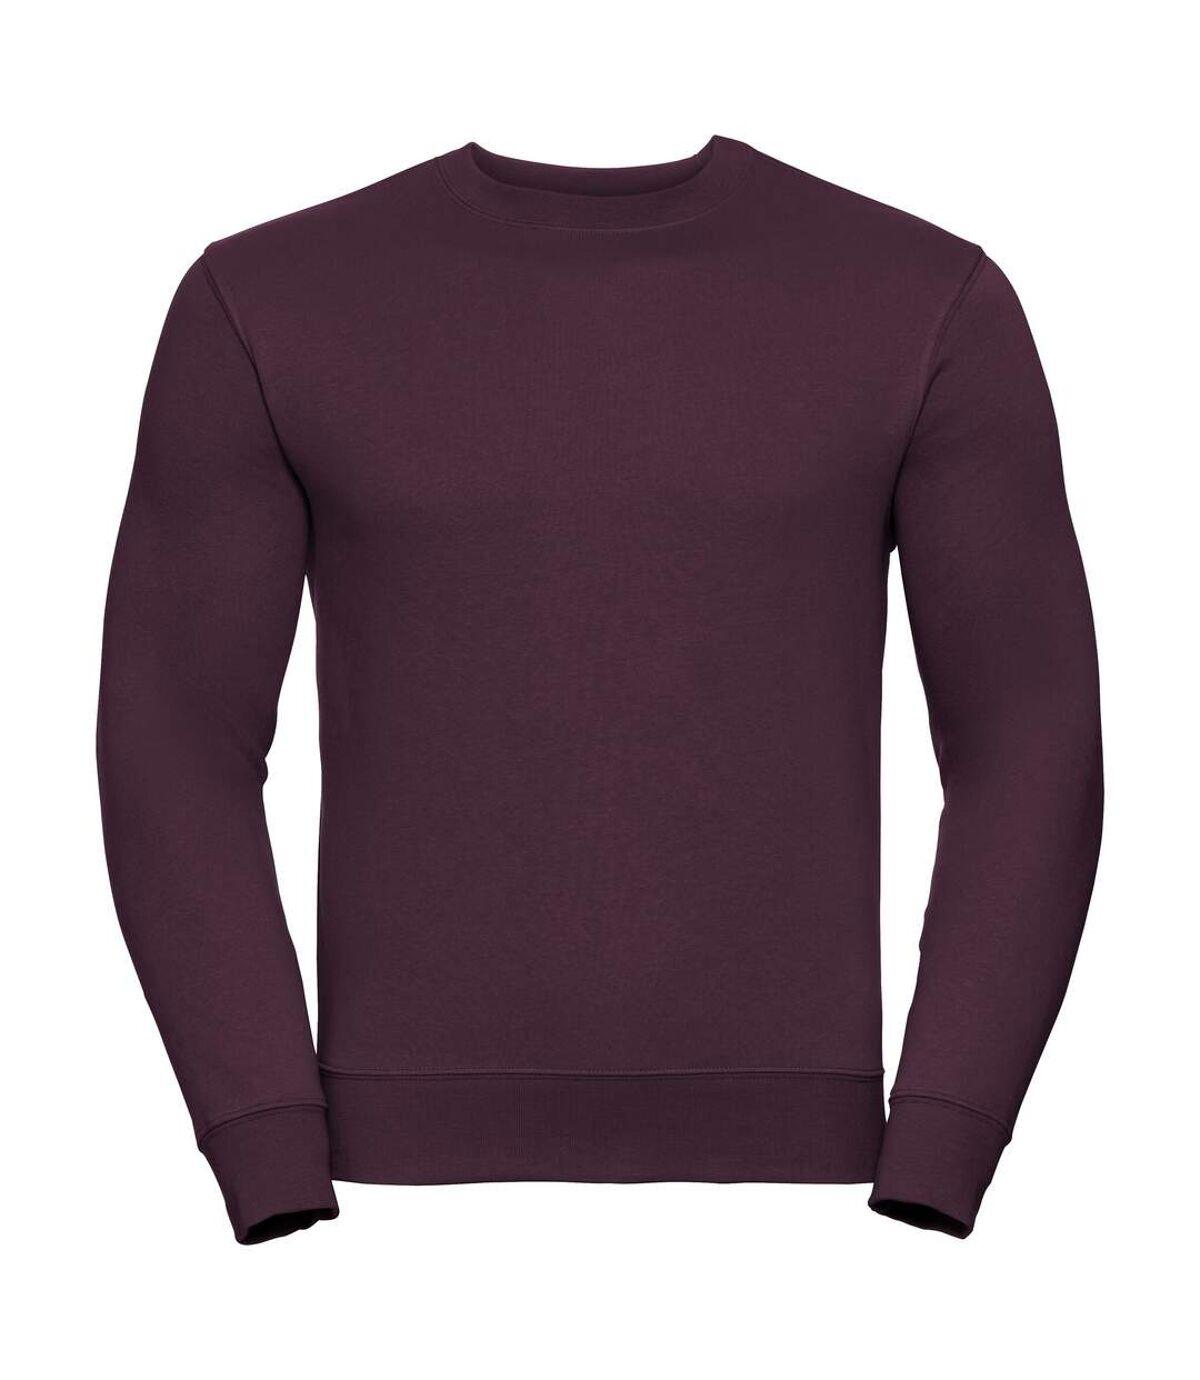 Russell Mens Authentic Sweatshirt (Slimmer Cut) (Burgundy) - UTBC2067